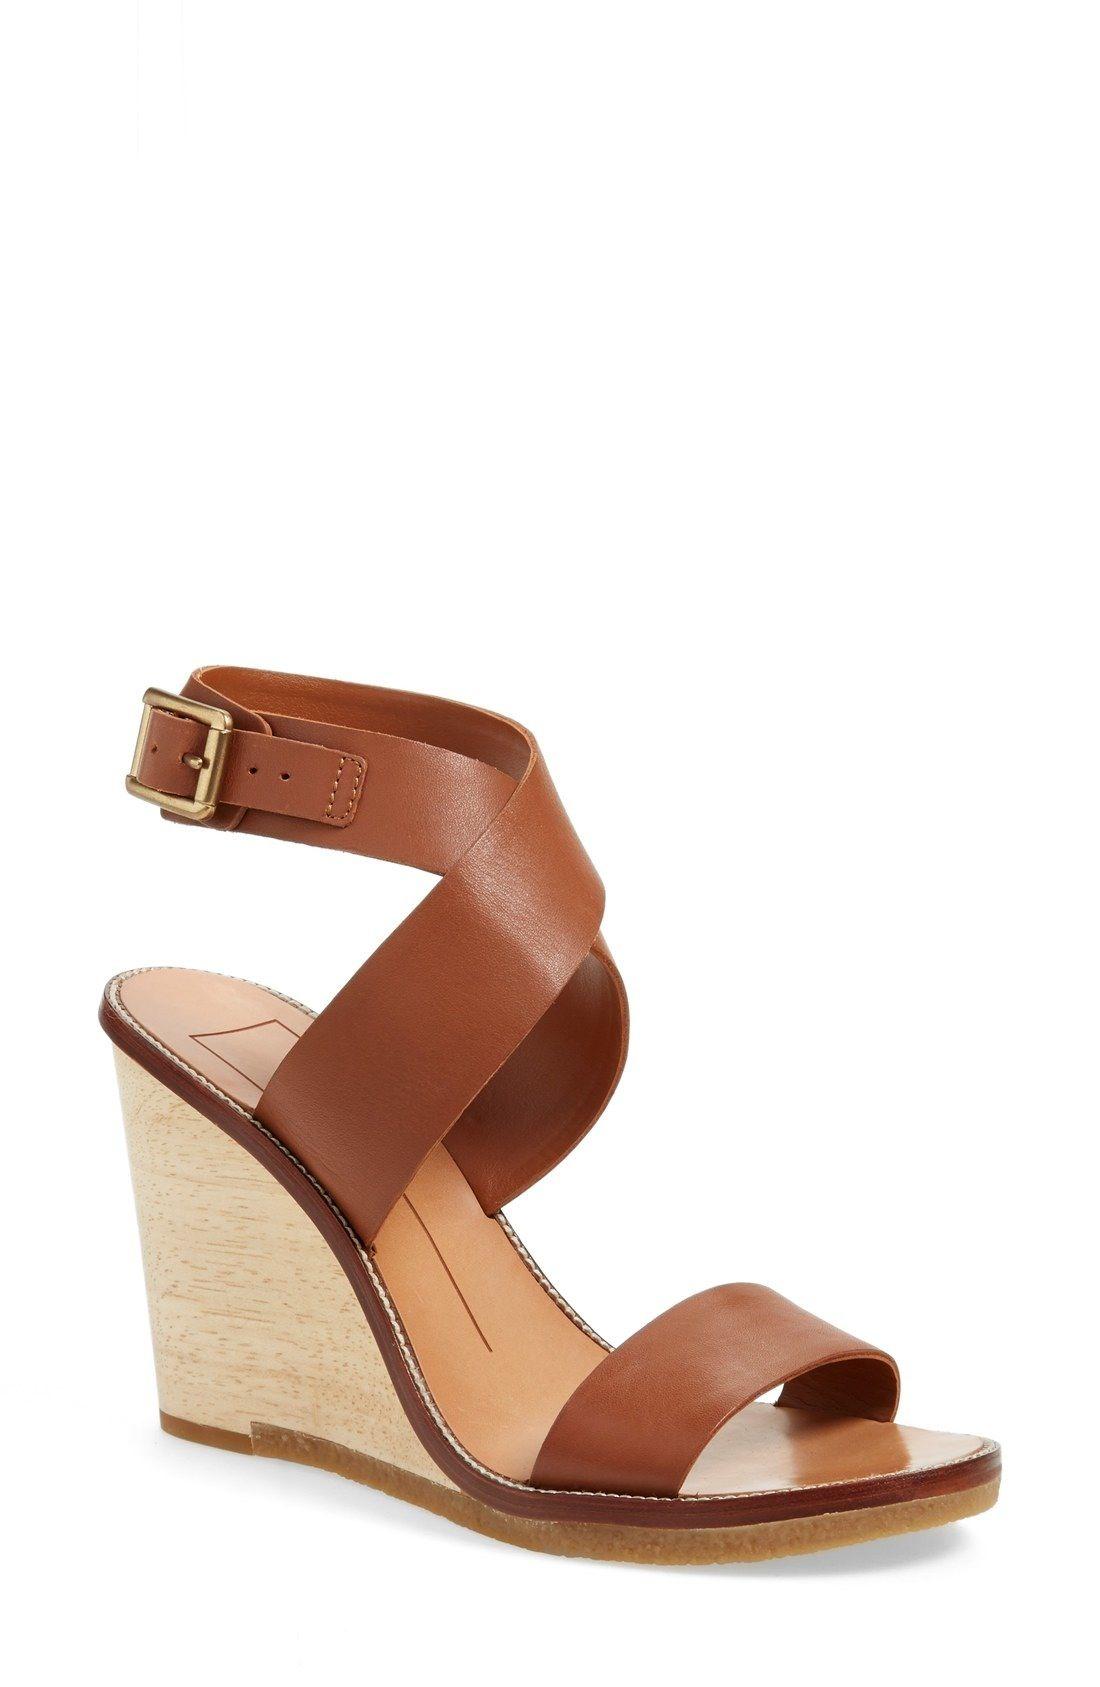 Dolce Vita 'Havana' Wedge Sandal (Women) available at #Nordstrom